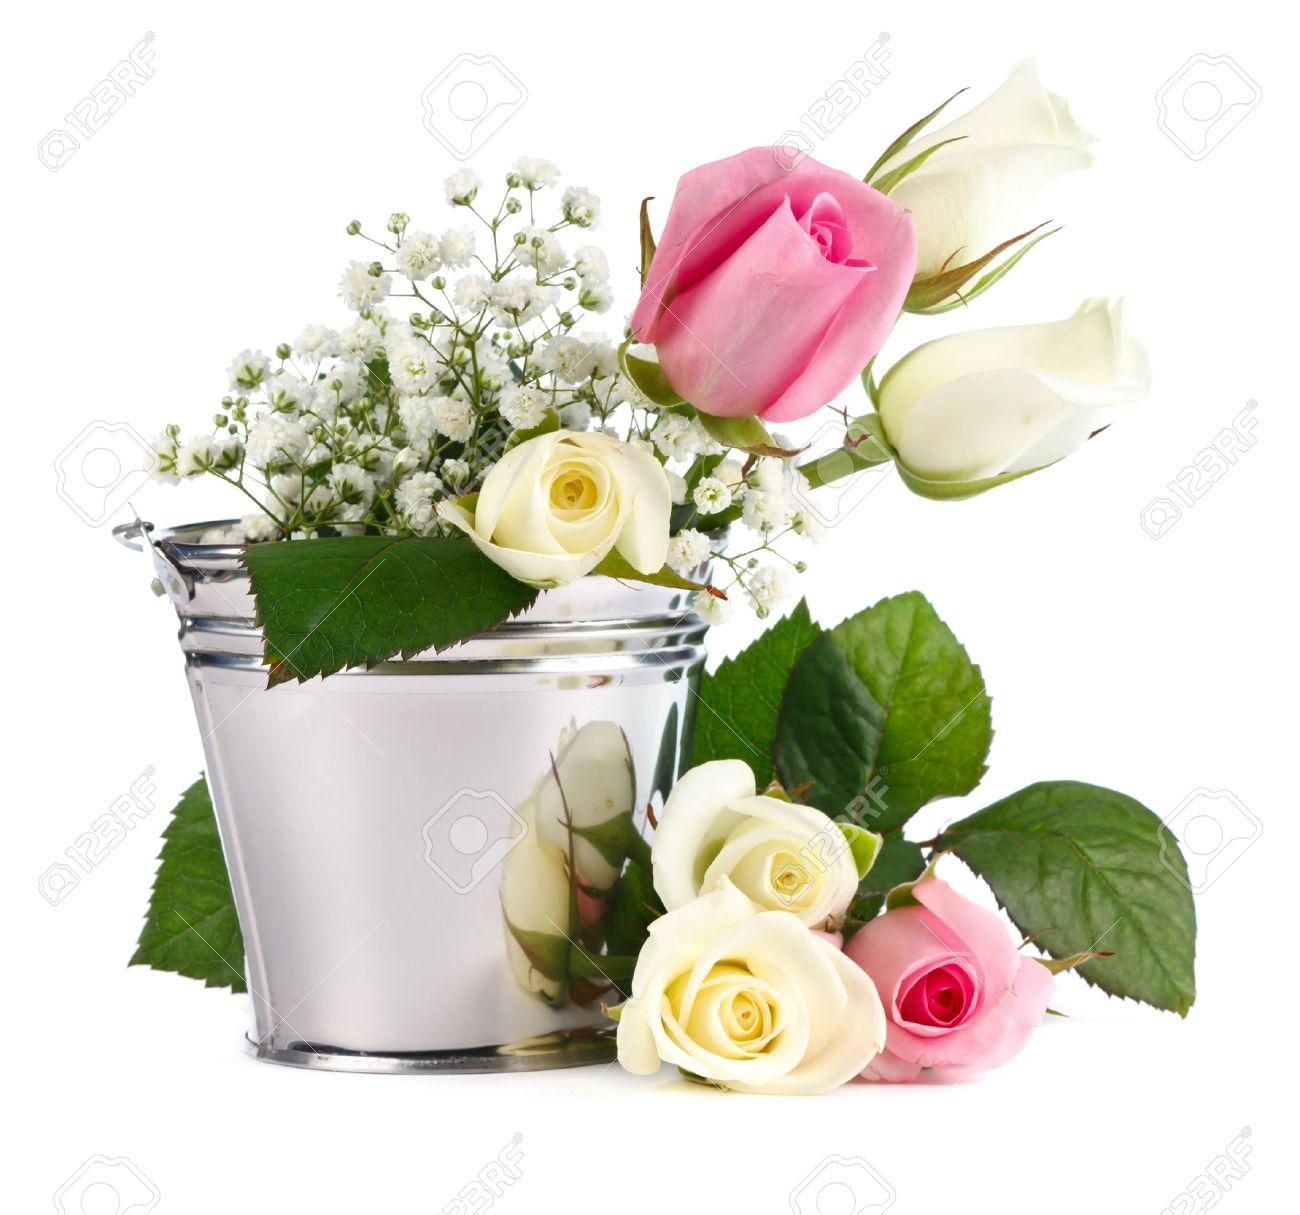 White flower buckets images flower decoration ideas fine white flower buckets images ball gown wedding dresses white flower buckets gallery flower decoration ideas mightylinksfo